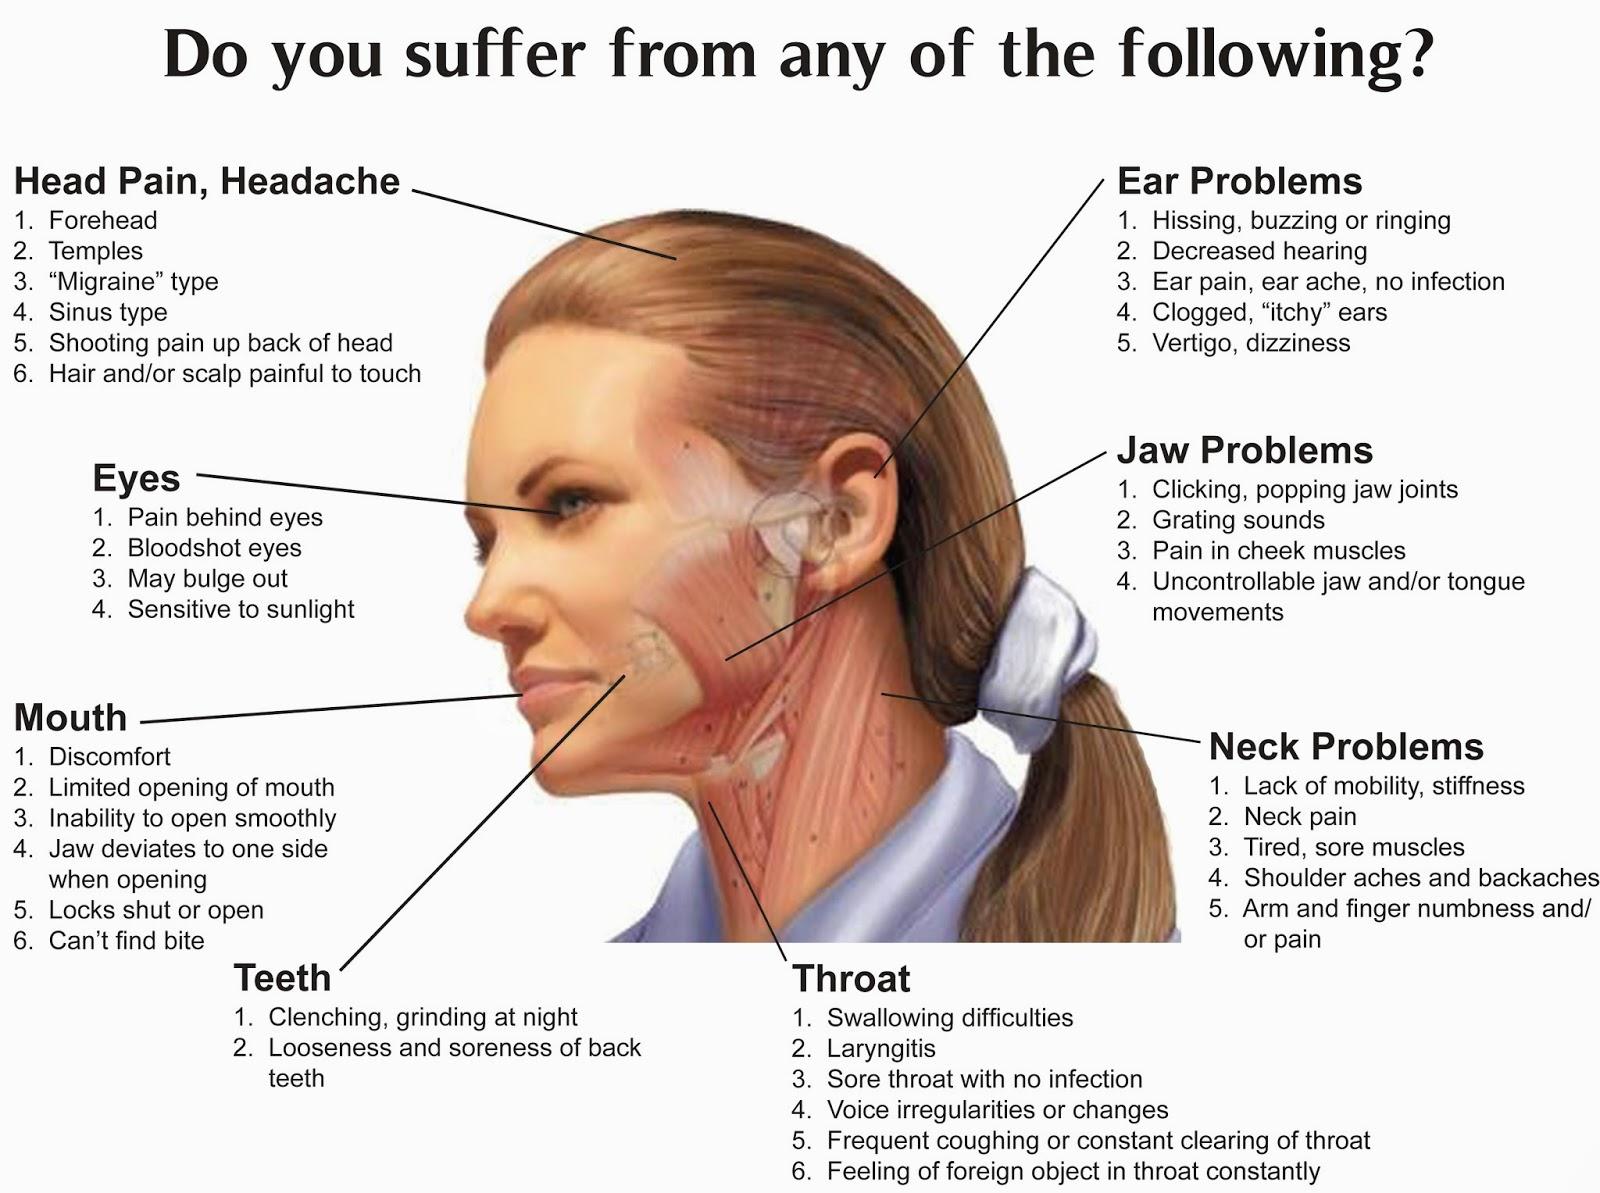 TEMPOROMANDIBULAR JOINTS SYNDROME (TMJ) Symptoms